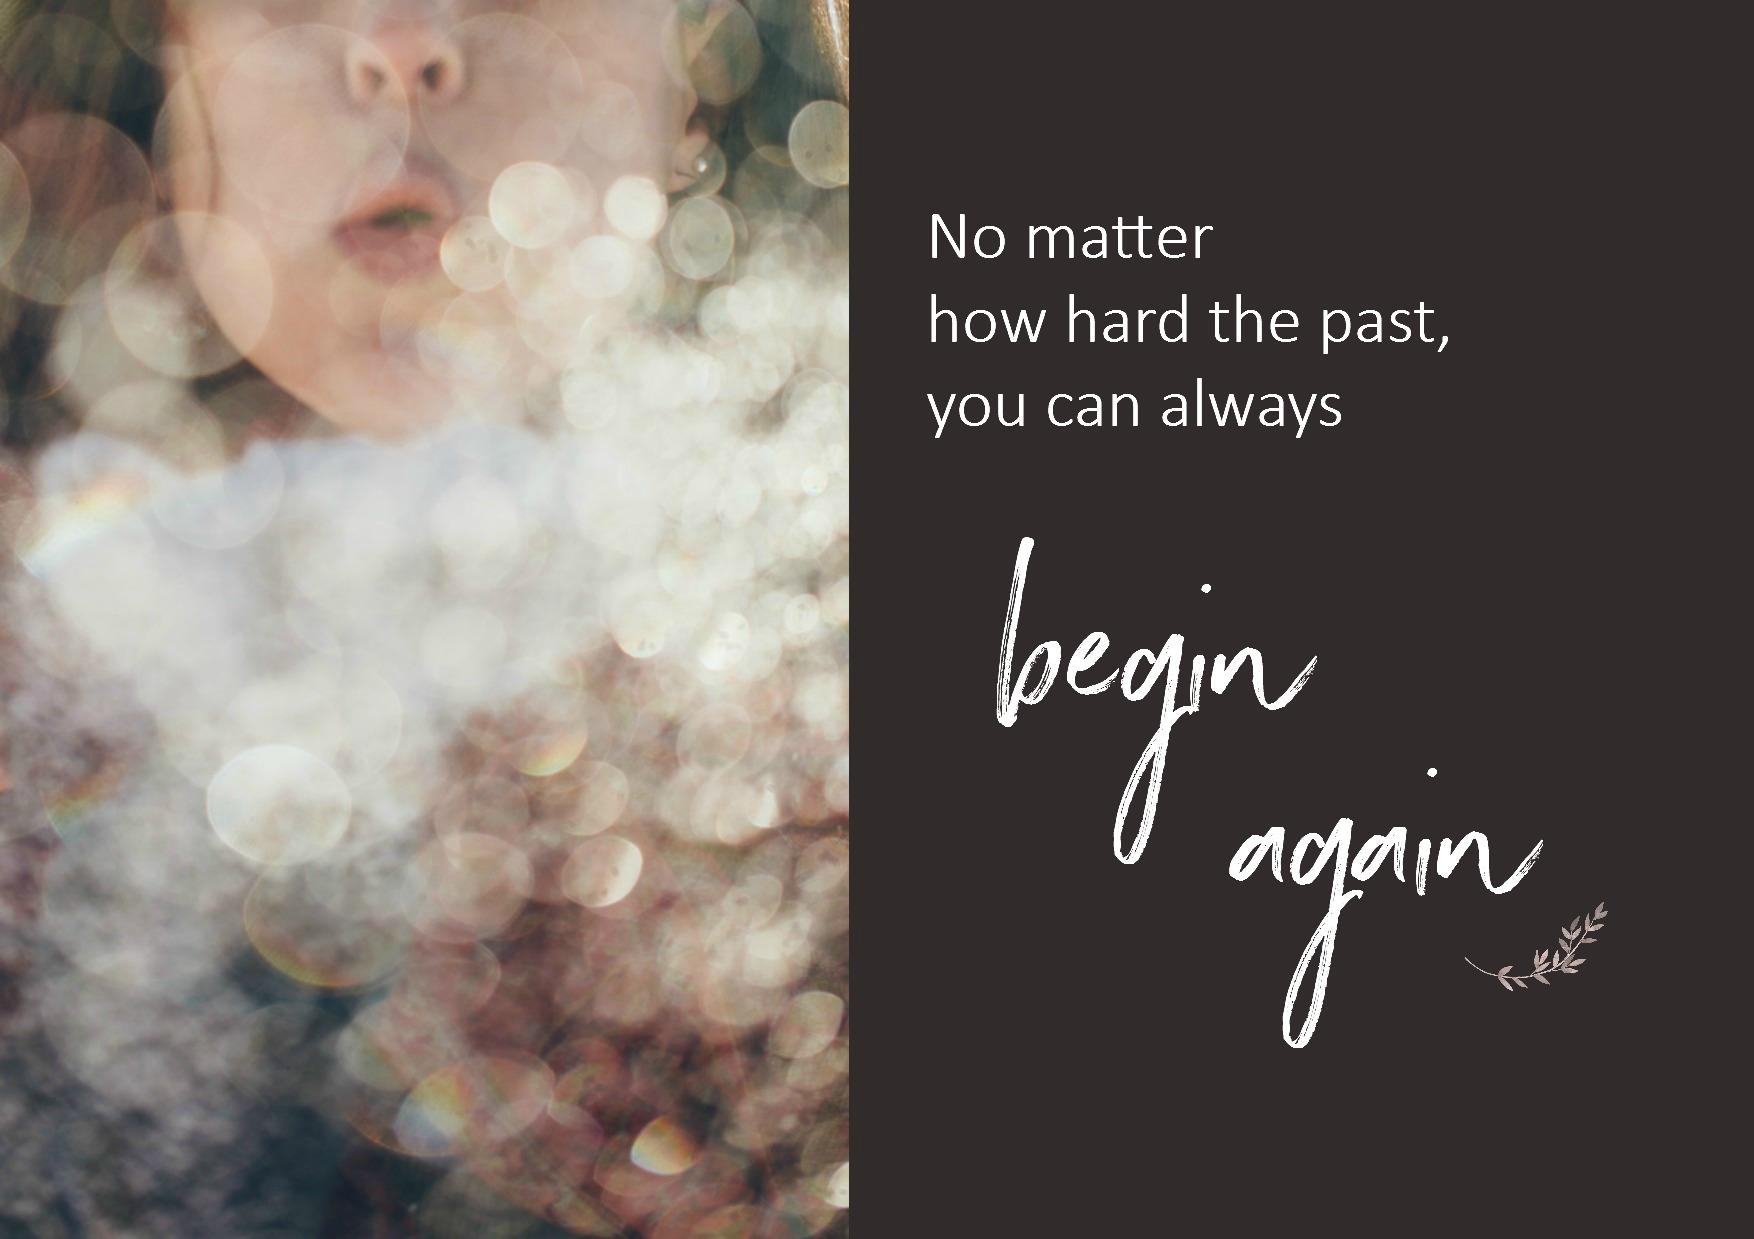 Begin Again2.jpg